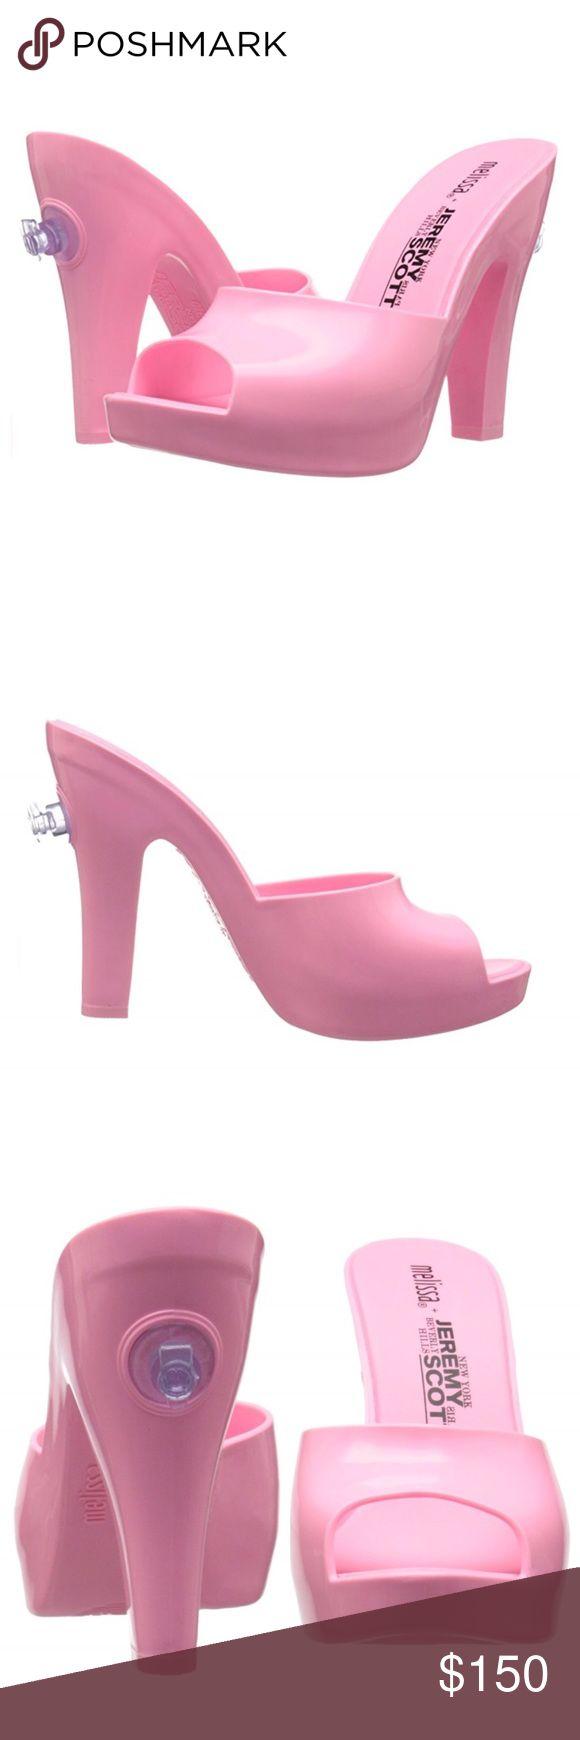 "♦️SALE♦️✨HP✨ Melissa + Jeremy Scott Pink Mules 100% PVC Synthetic sole Heel measures approximately 4.75"" Platform measures approximately 1"" New in box Melissa Shoes Mules & Clogs"